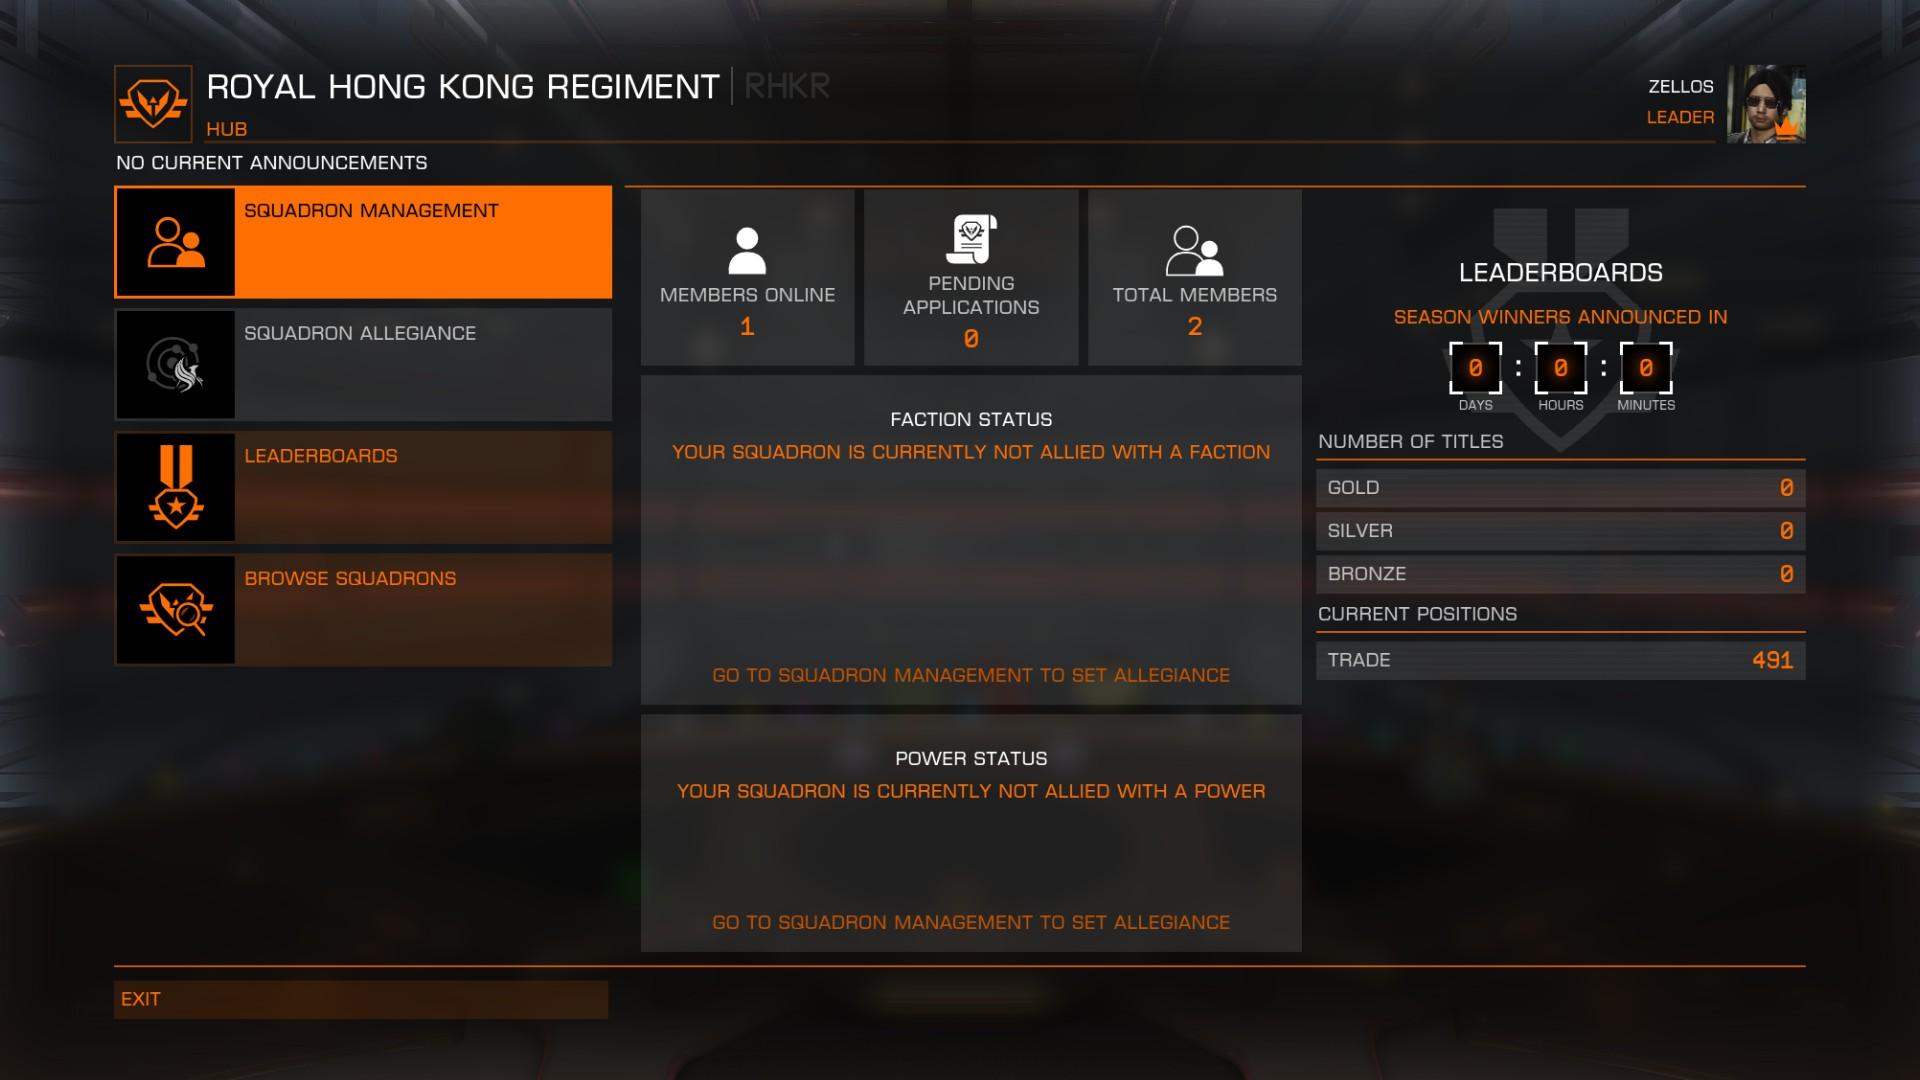 [Elite: Dangerous] 香港人公會 RHKR